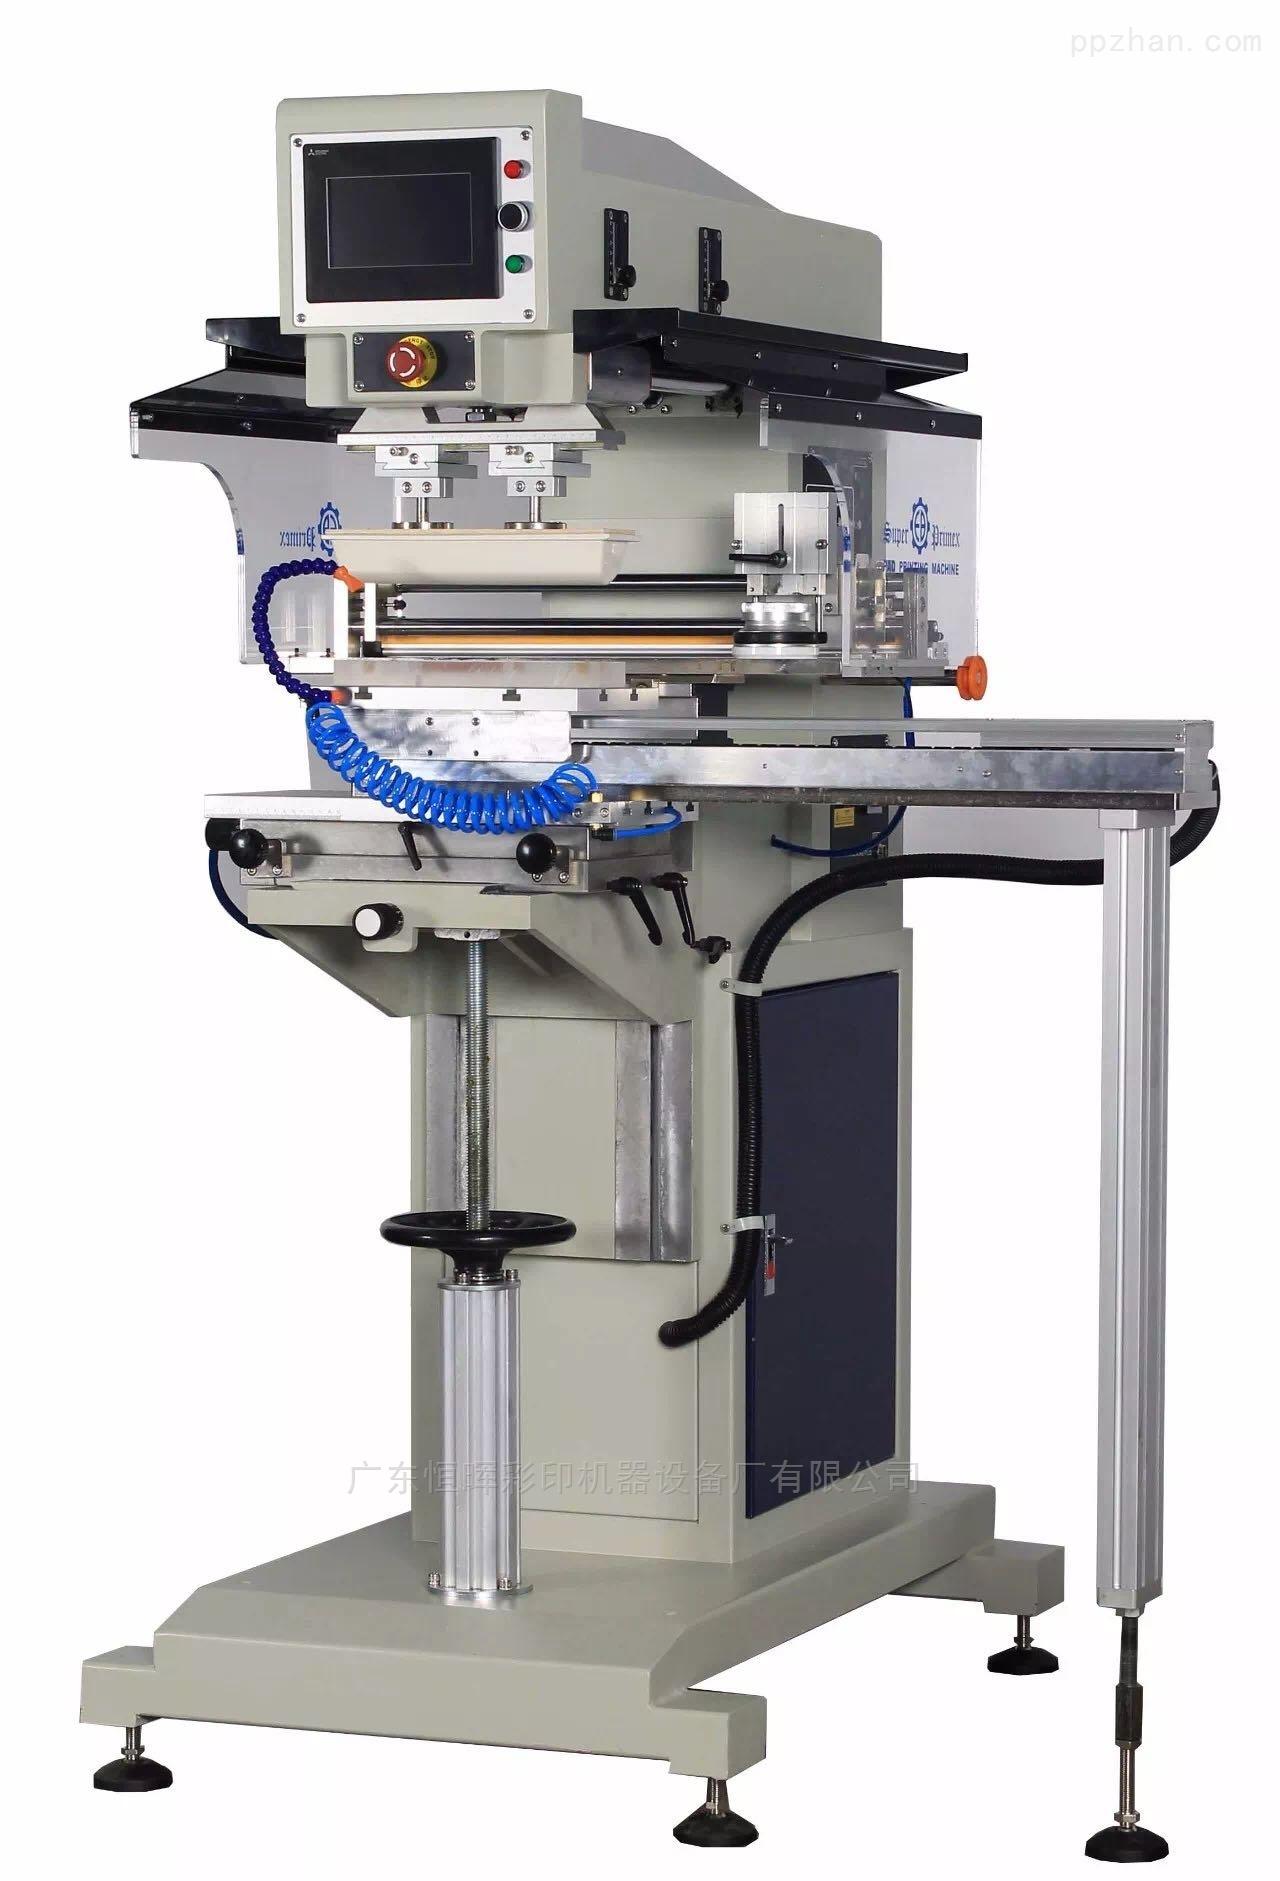 SPCST-818SD-密封式油盅移印机|恒晖大品牌值得信任